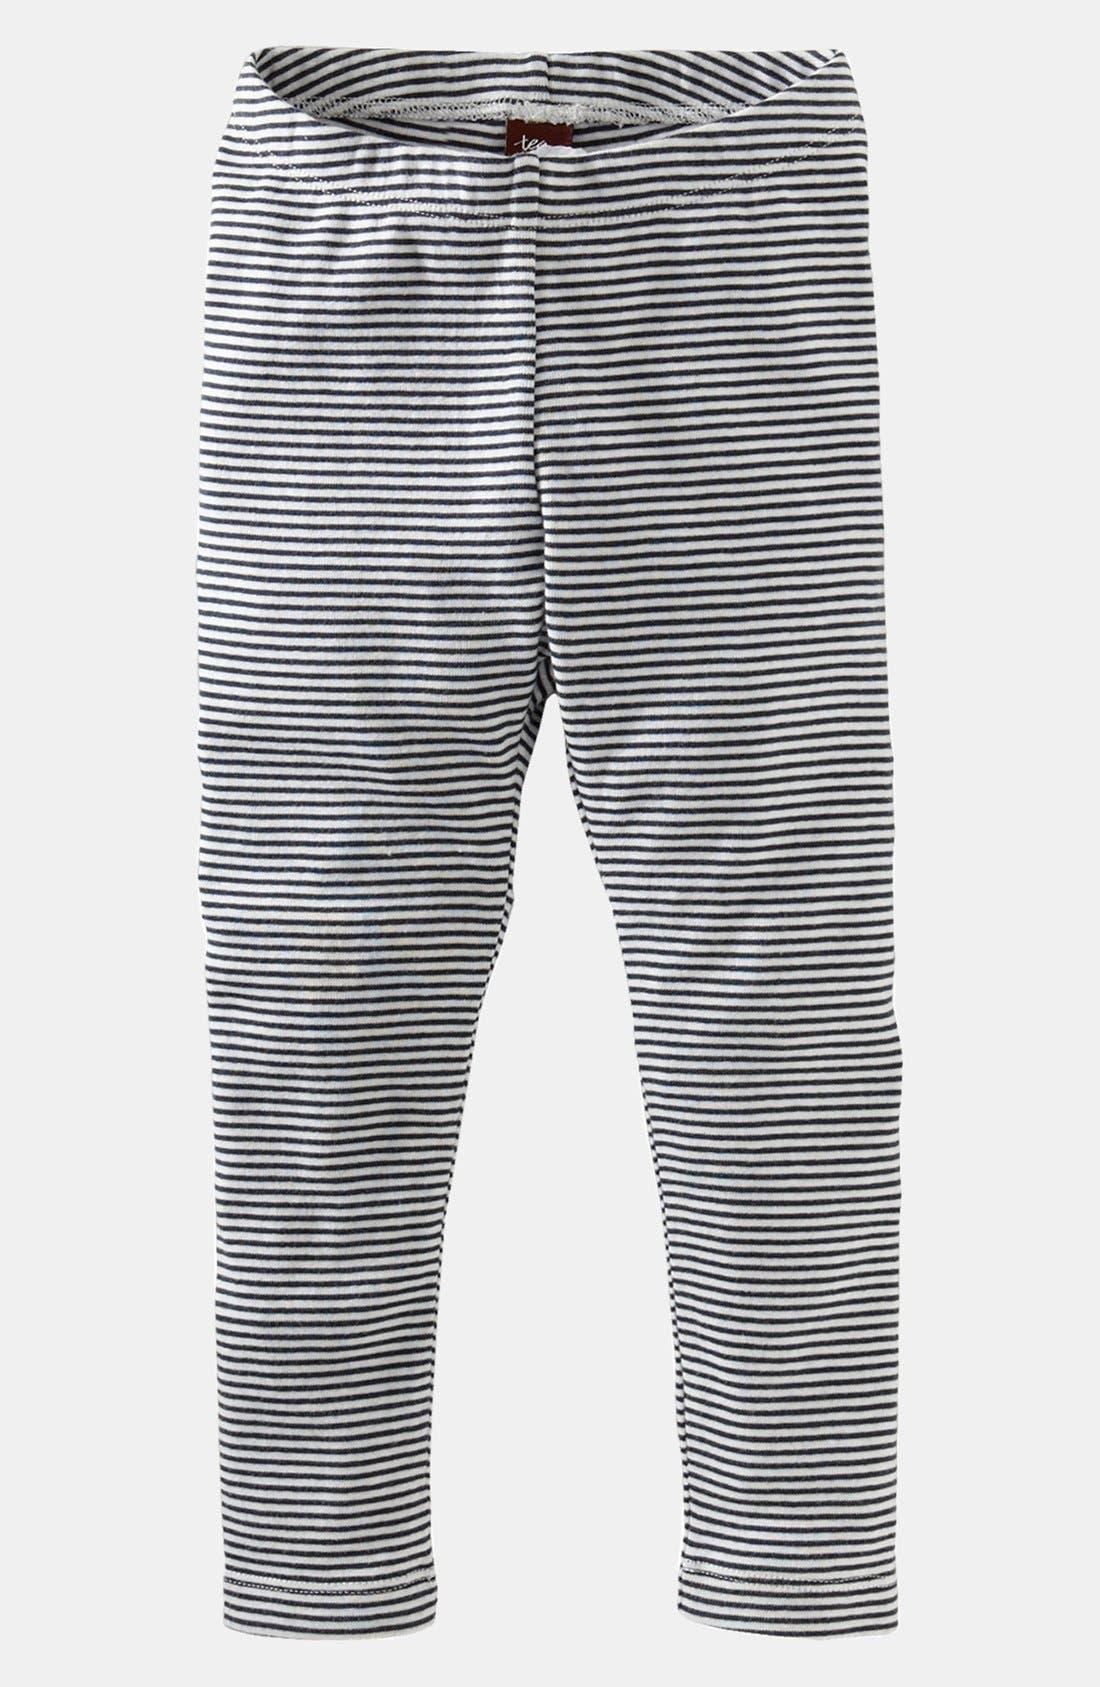 Alternate Image 1 Selected - Tea Collection Stripe Leggings (Toddler Girls)